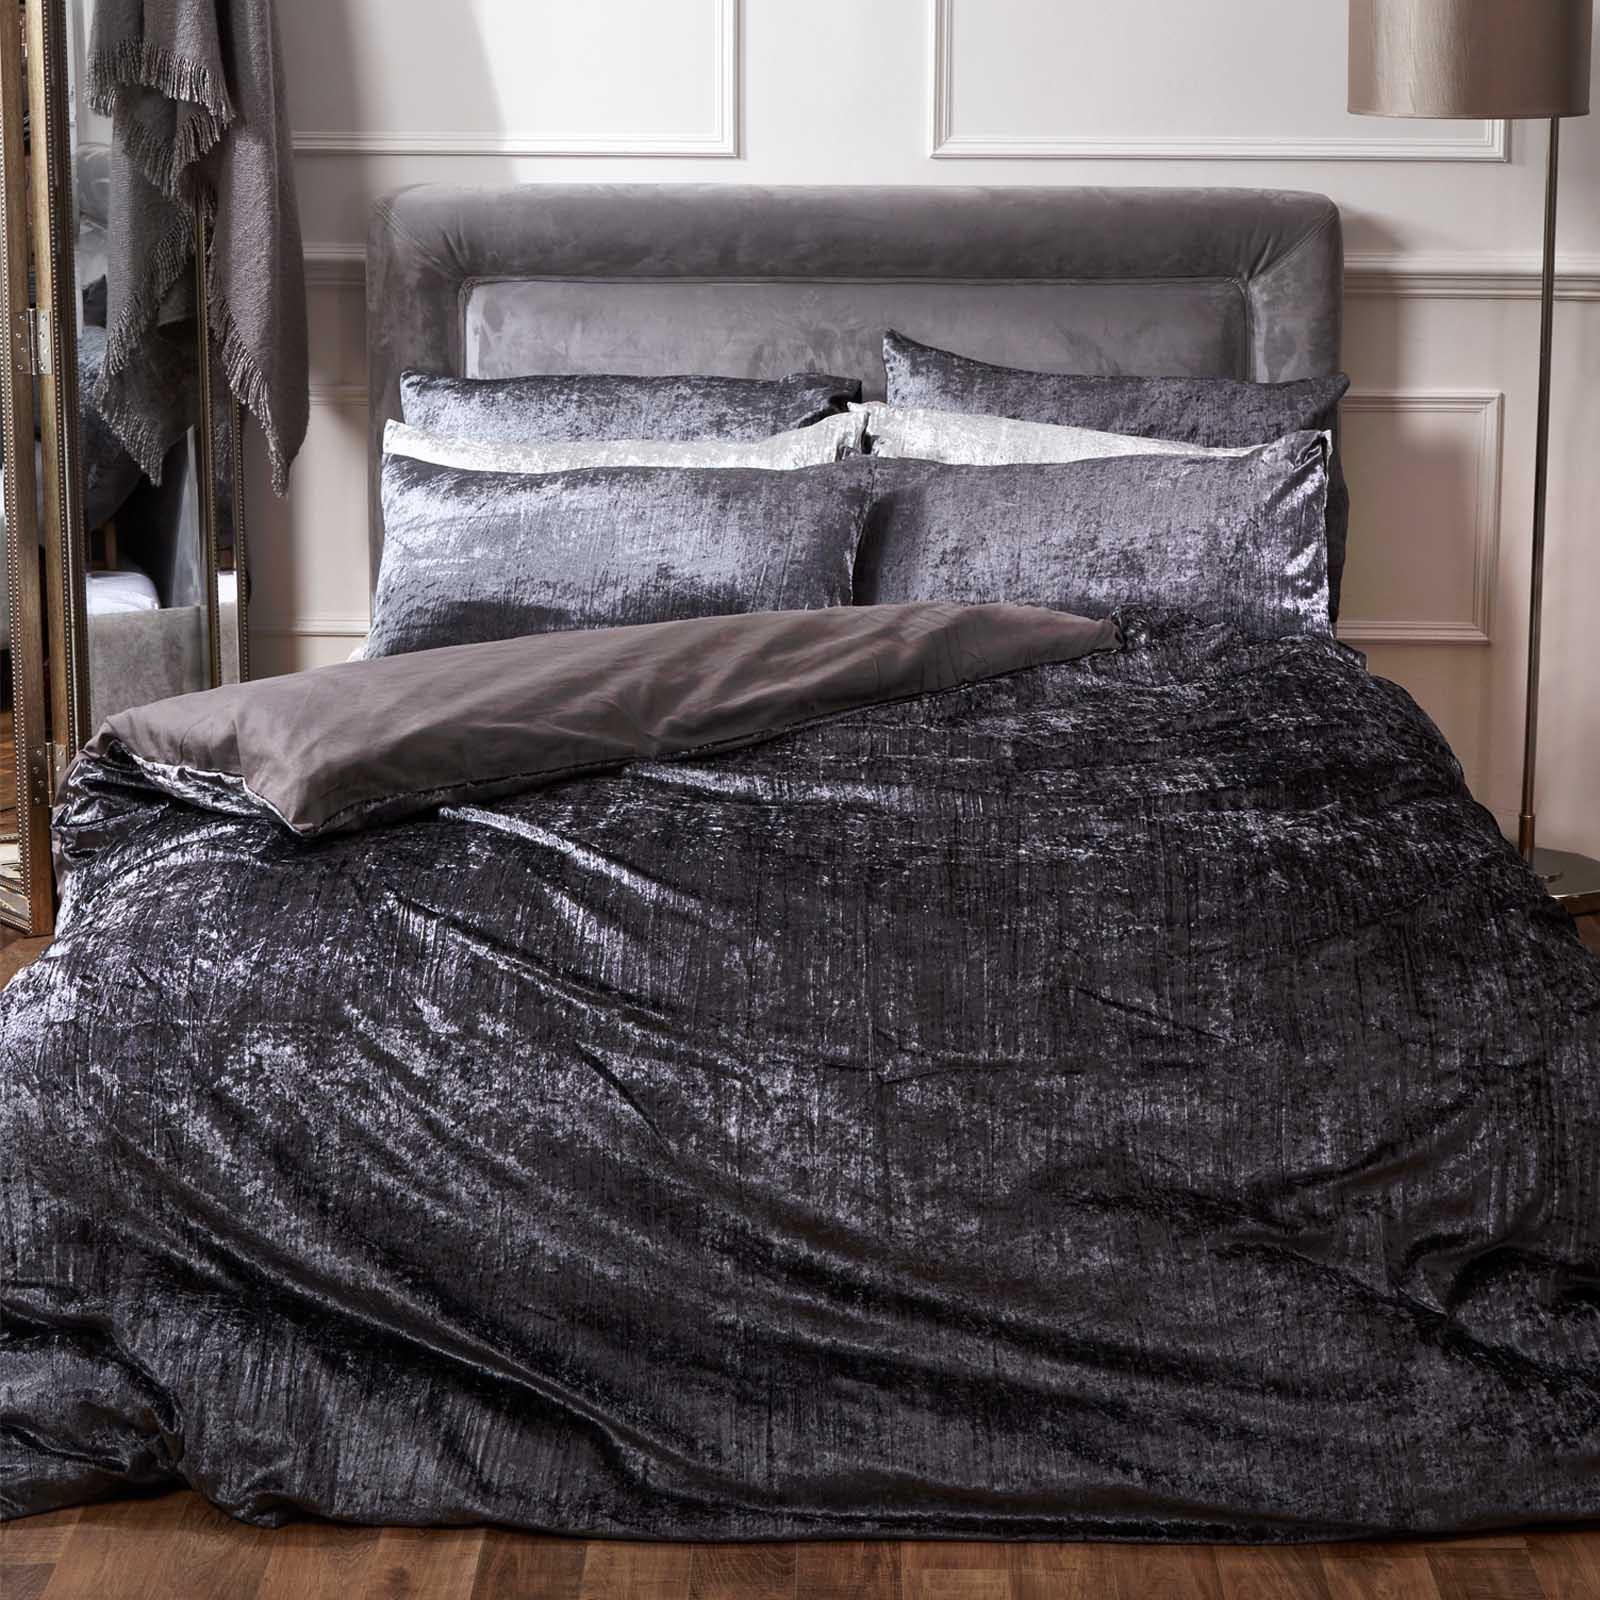 Sienna Crinkle Full Crushed Velvet Duvet Cover with 2 x Pillowcases Valencia Bedding Set (double) for £20.98 delivered @ Onlinehomeshop